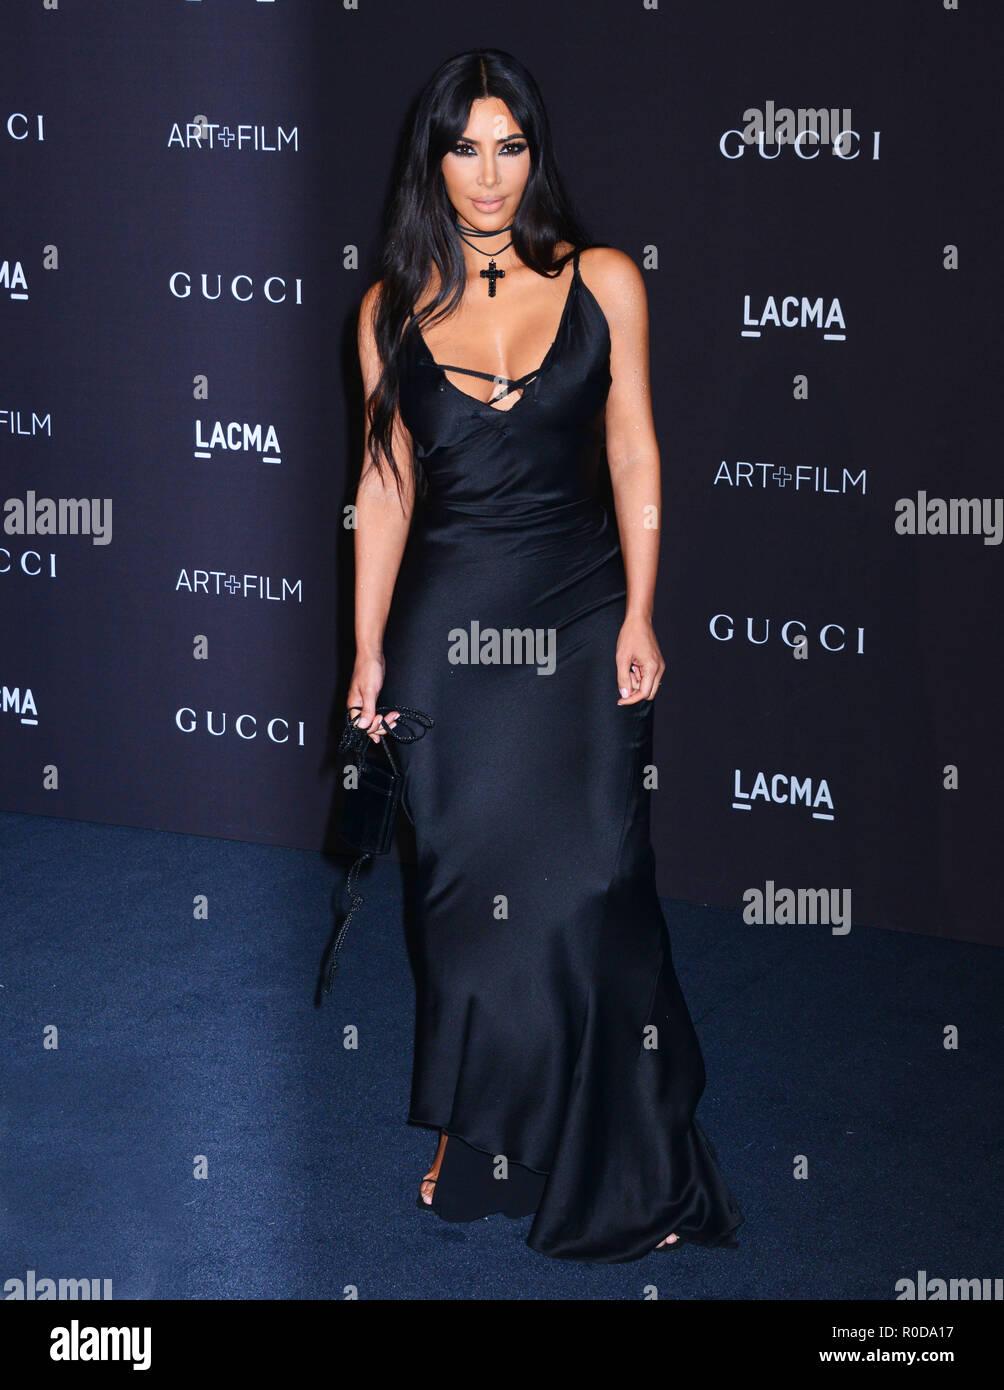 96b6364820 Kim Kardashian West Stock Photos   Kim Kardashian West Stock Images ...